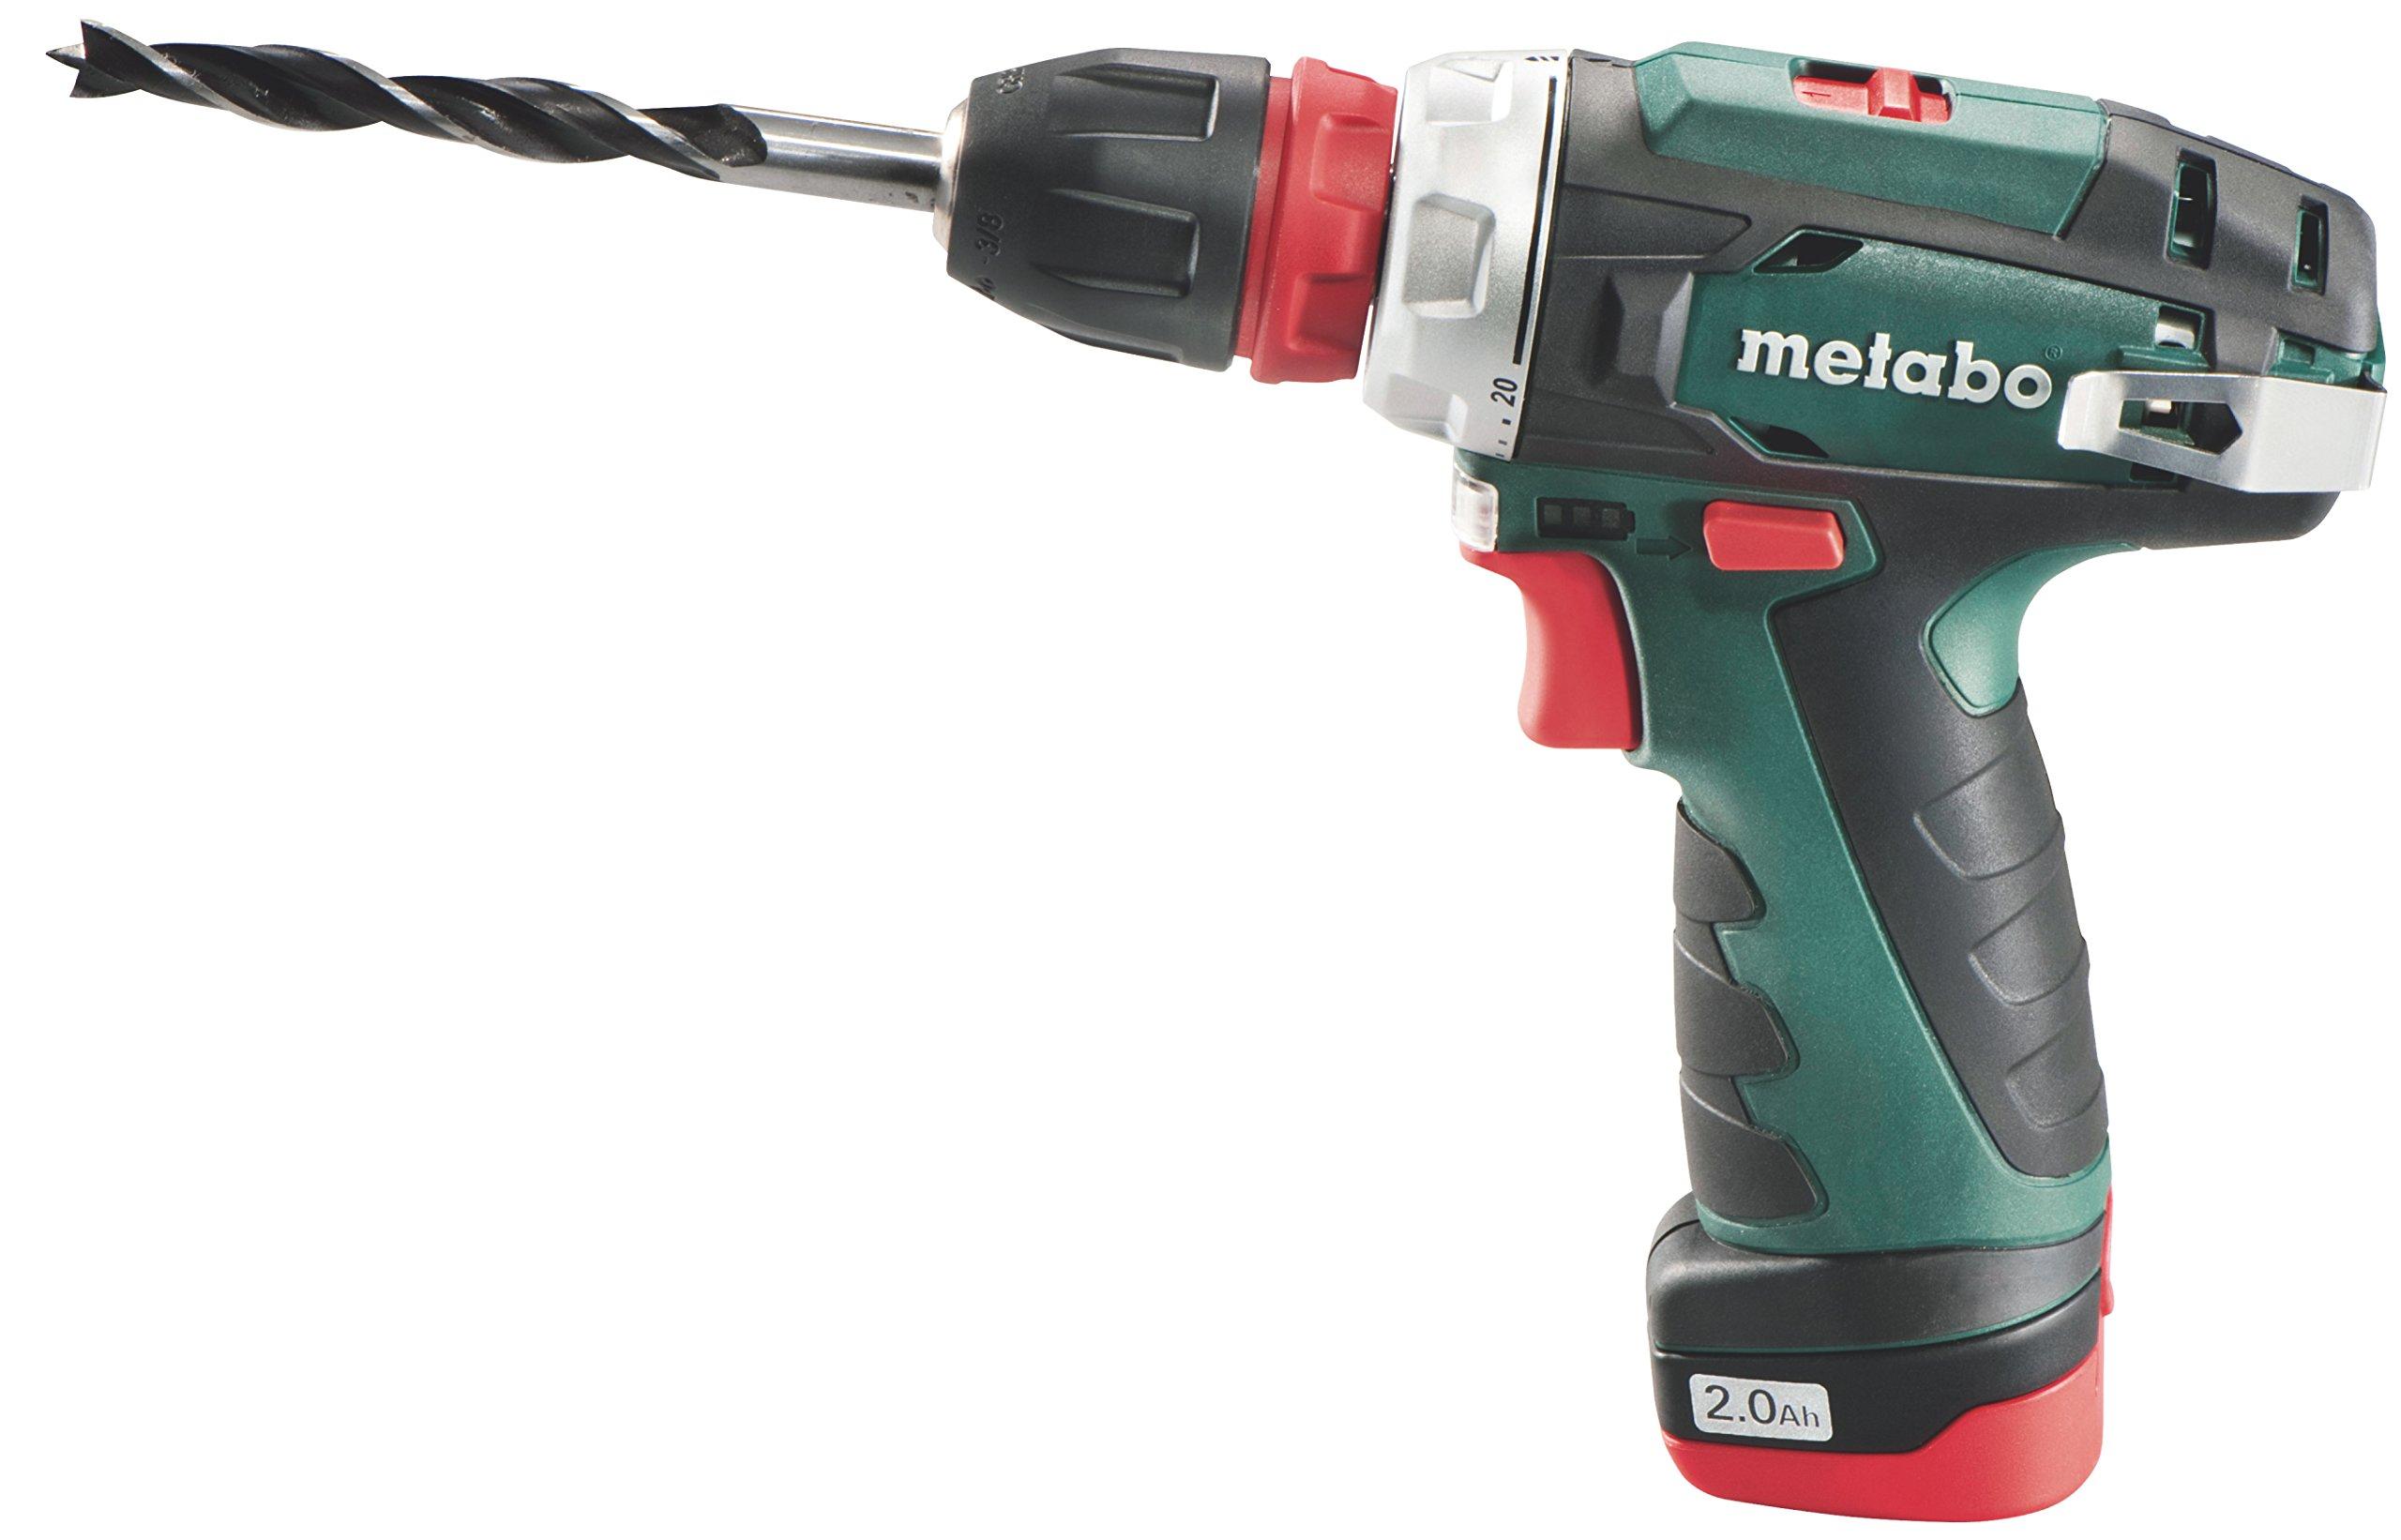 Metabo-600157700-Pro-PowerMaxx-BS-Quick-ProAkku-BohrschTV00-108-V-Schwarz-Grn